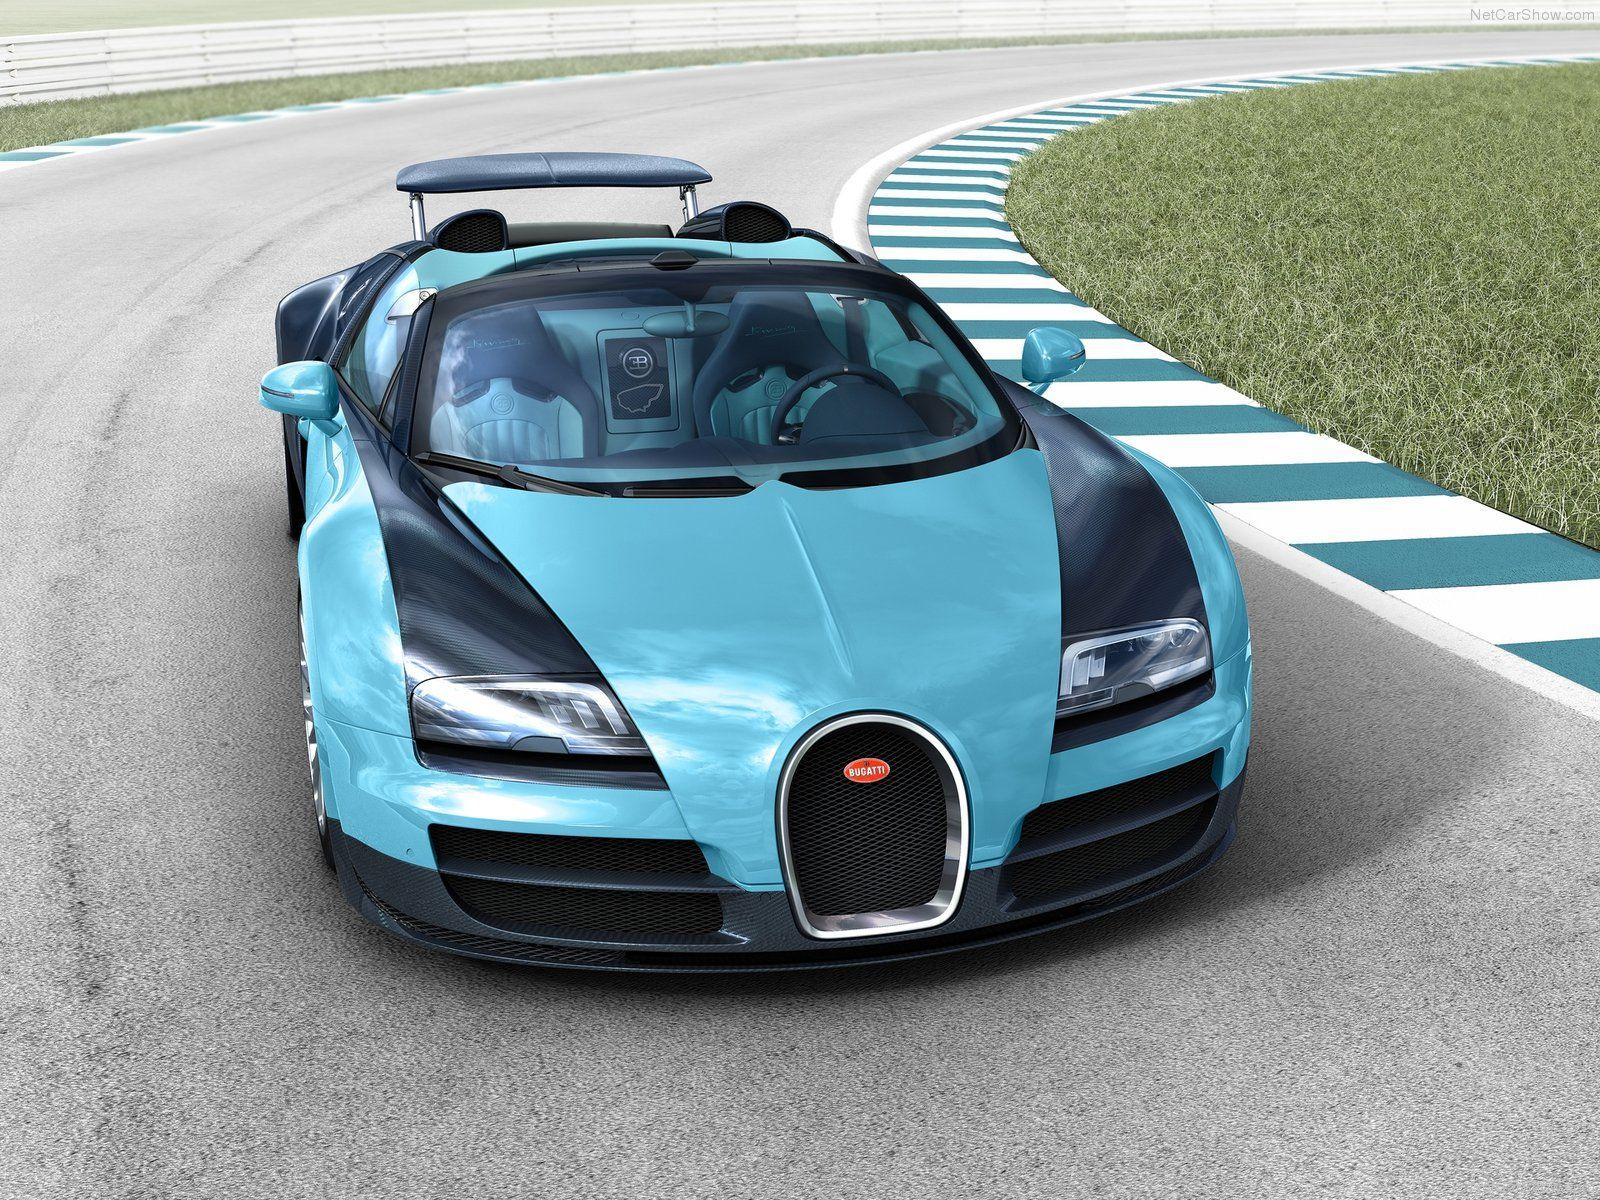 abe5ca83b2a27e4b9cff56d143209031 Terrific Bugatti Veyron 16.4 Grand Sport Vitesse Prix Cars Trend